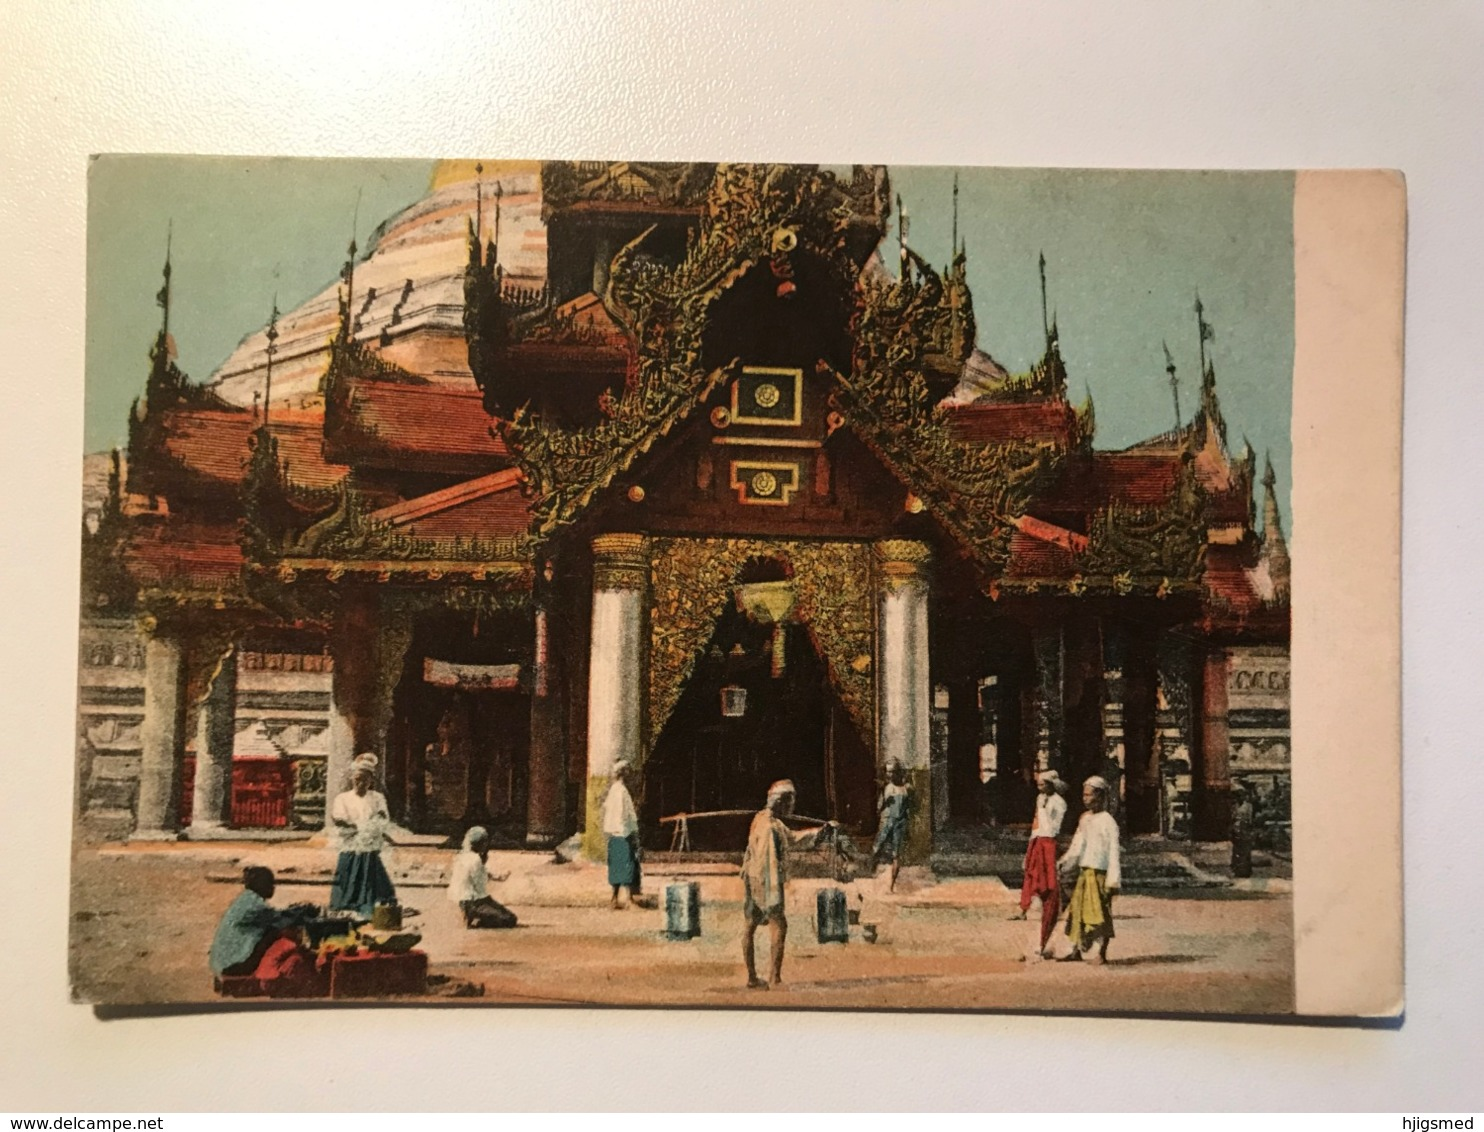 Asia Myanmar Mianmar Burma Birmania Church Temple Water Carrier 11724 Post Card Postkarte POSTCARD - Myanmar (Burma)